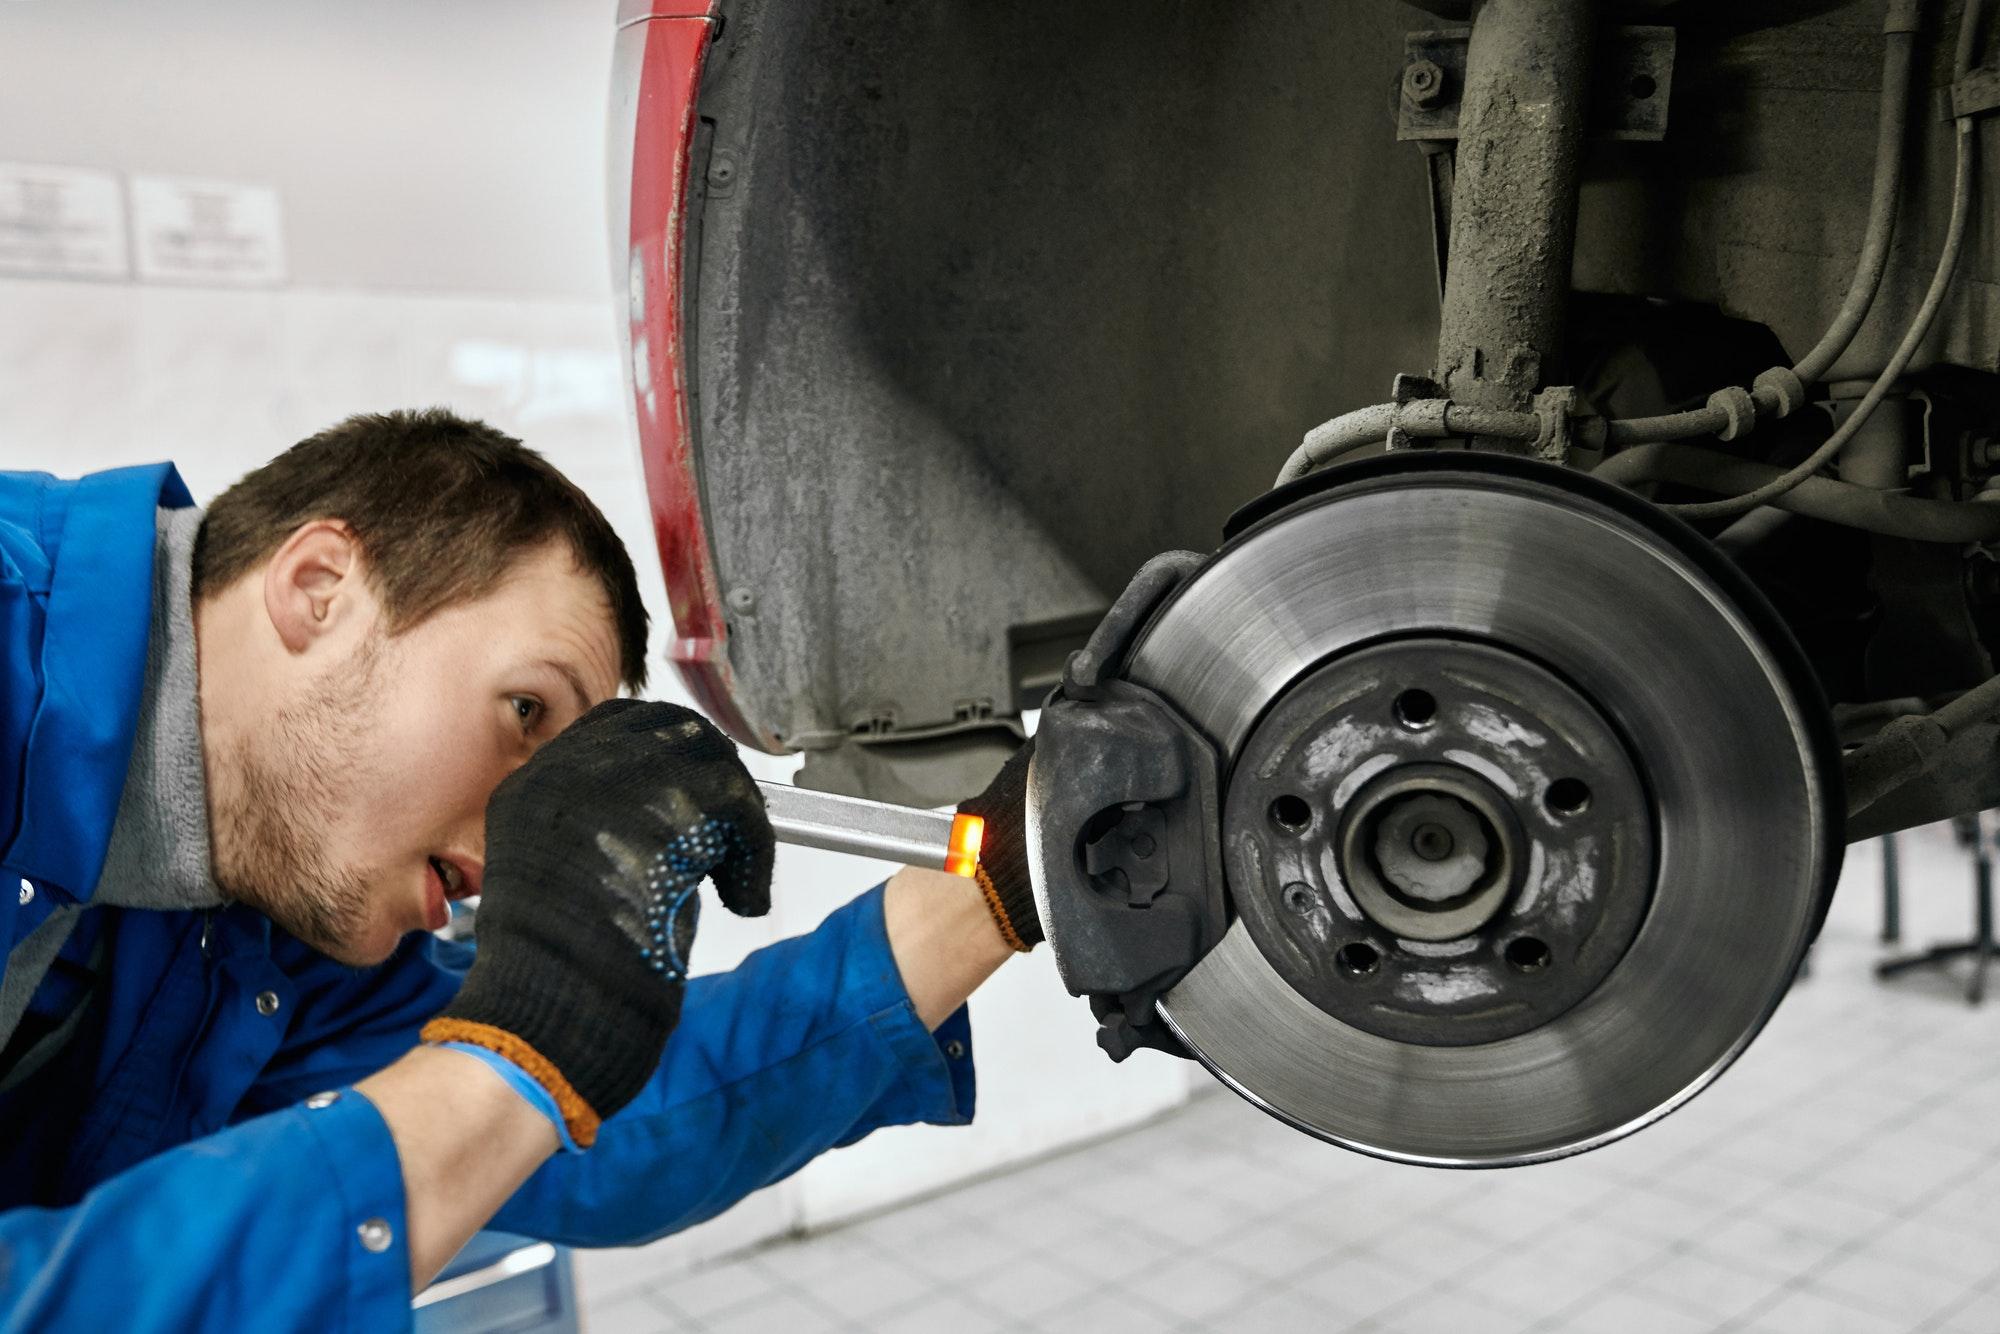 Male mechanic holding flashlight and examining brake pads